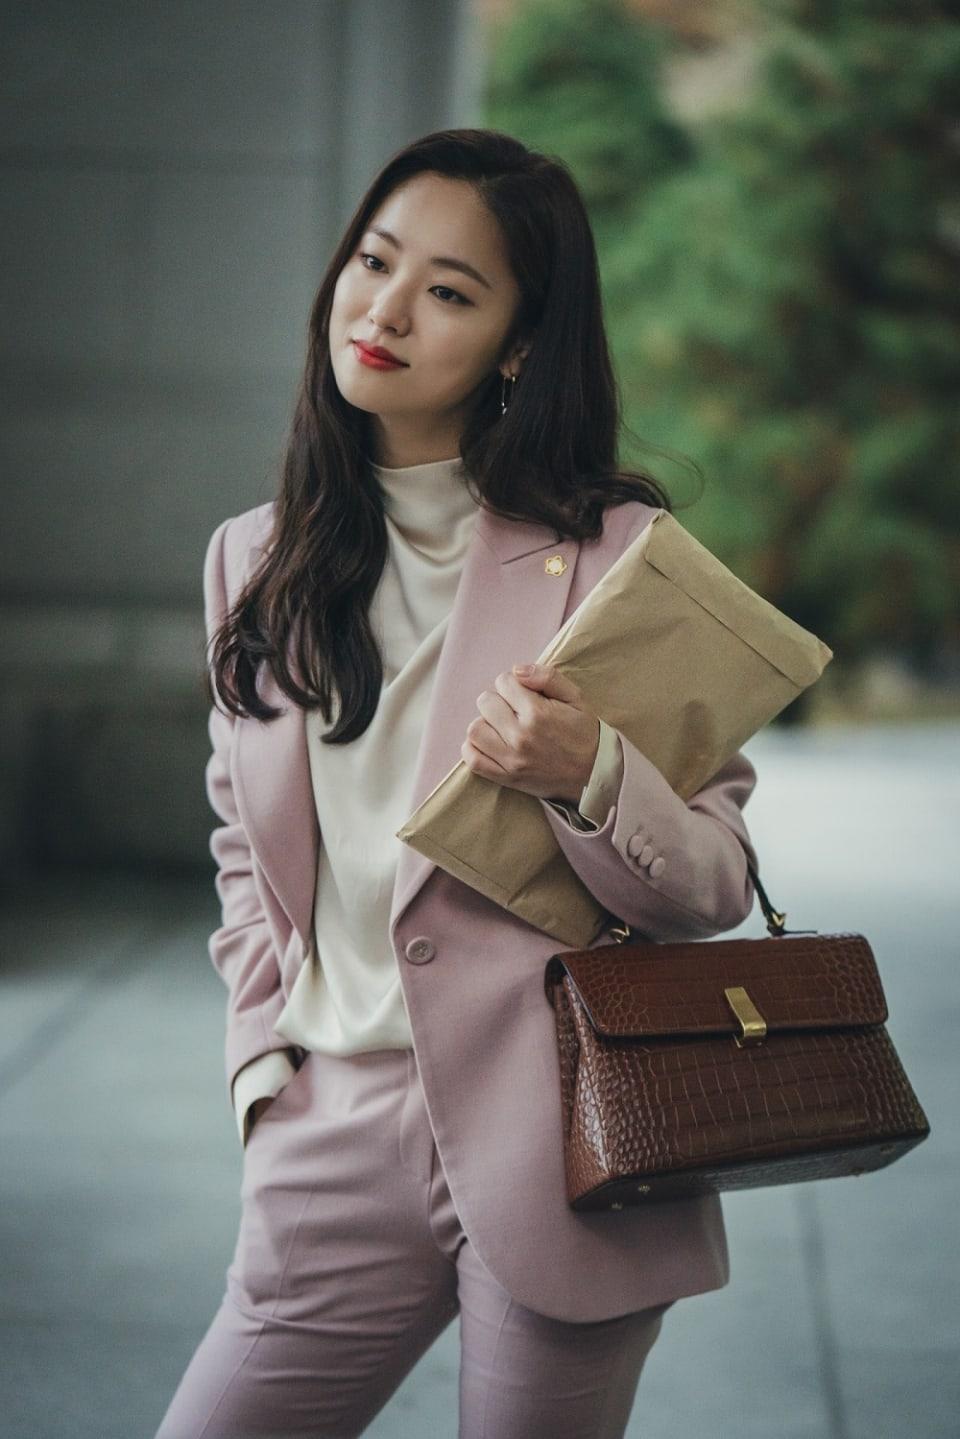 Jeon Yeo Bin in Vincenzo